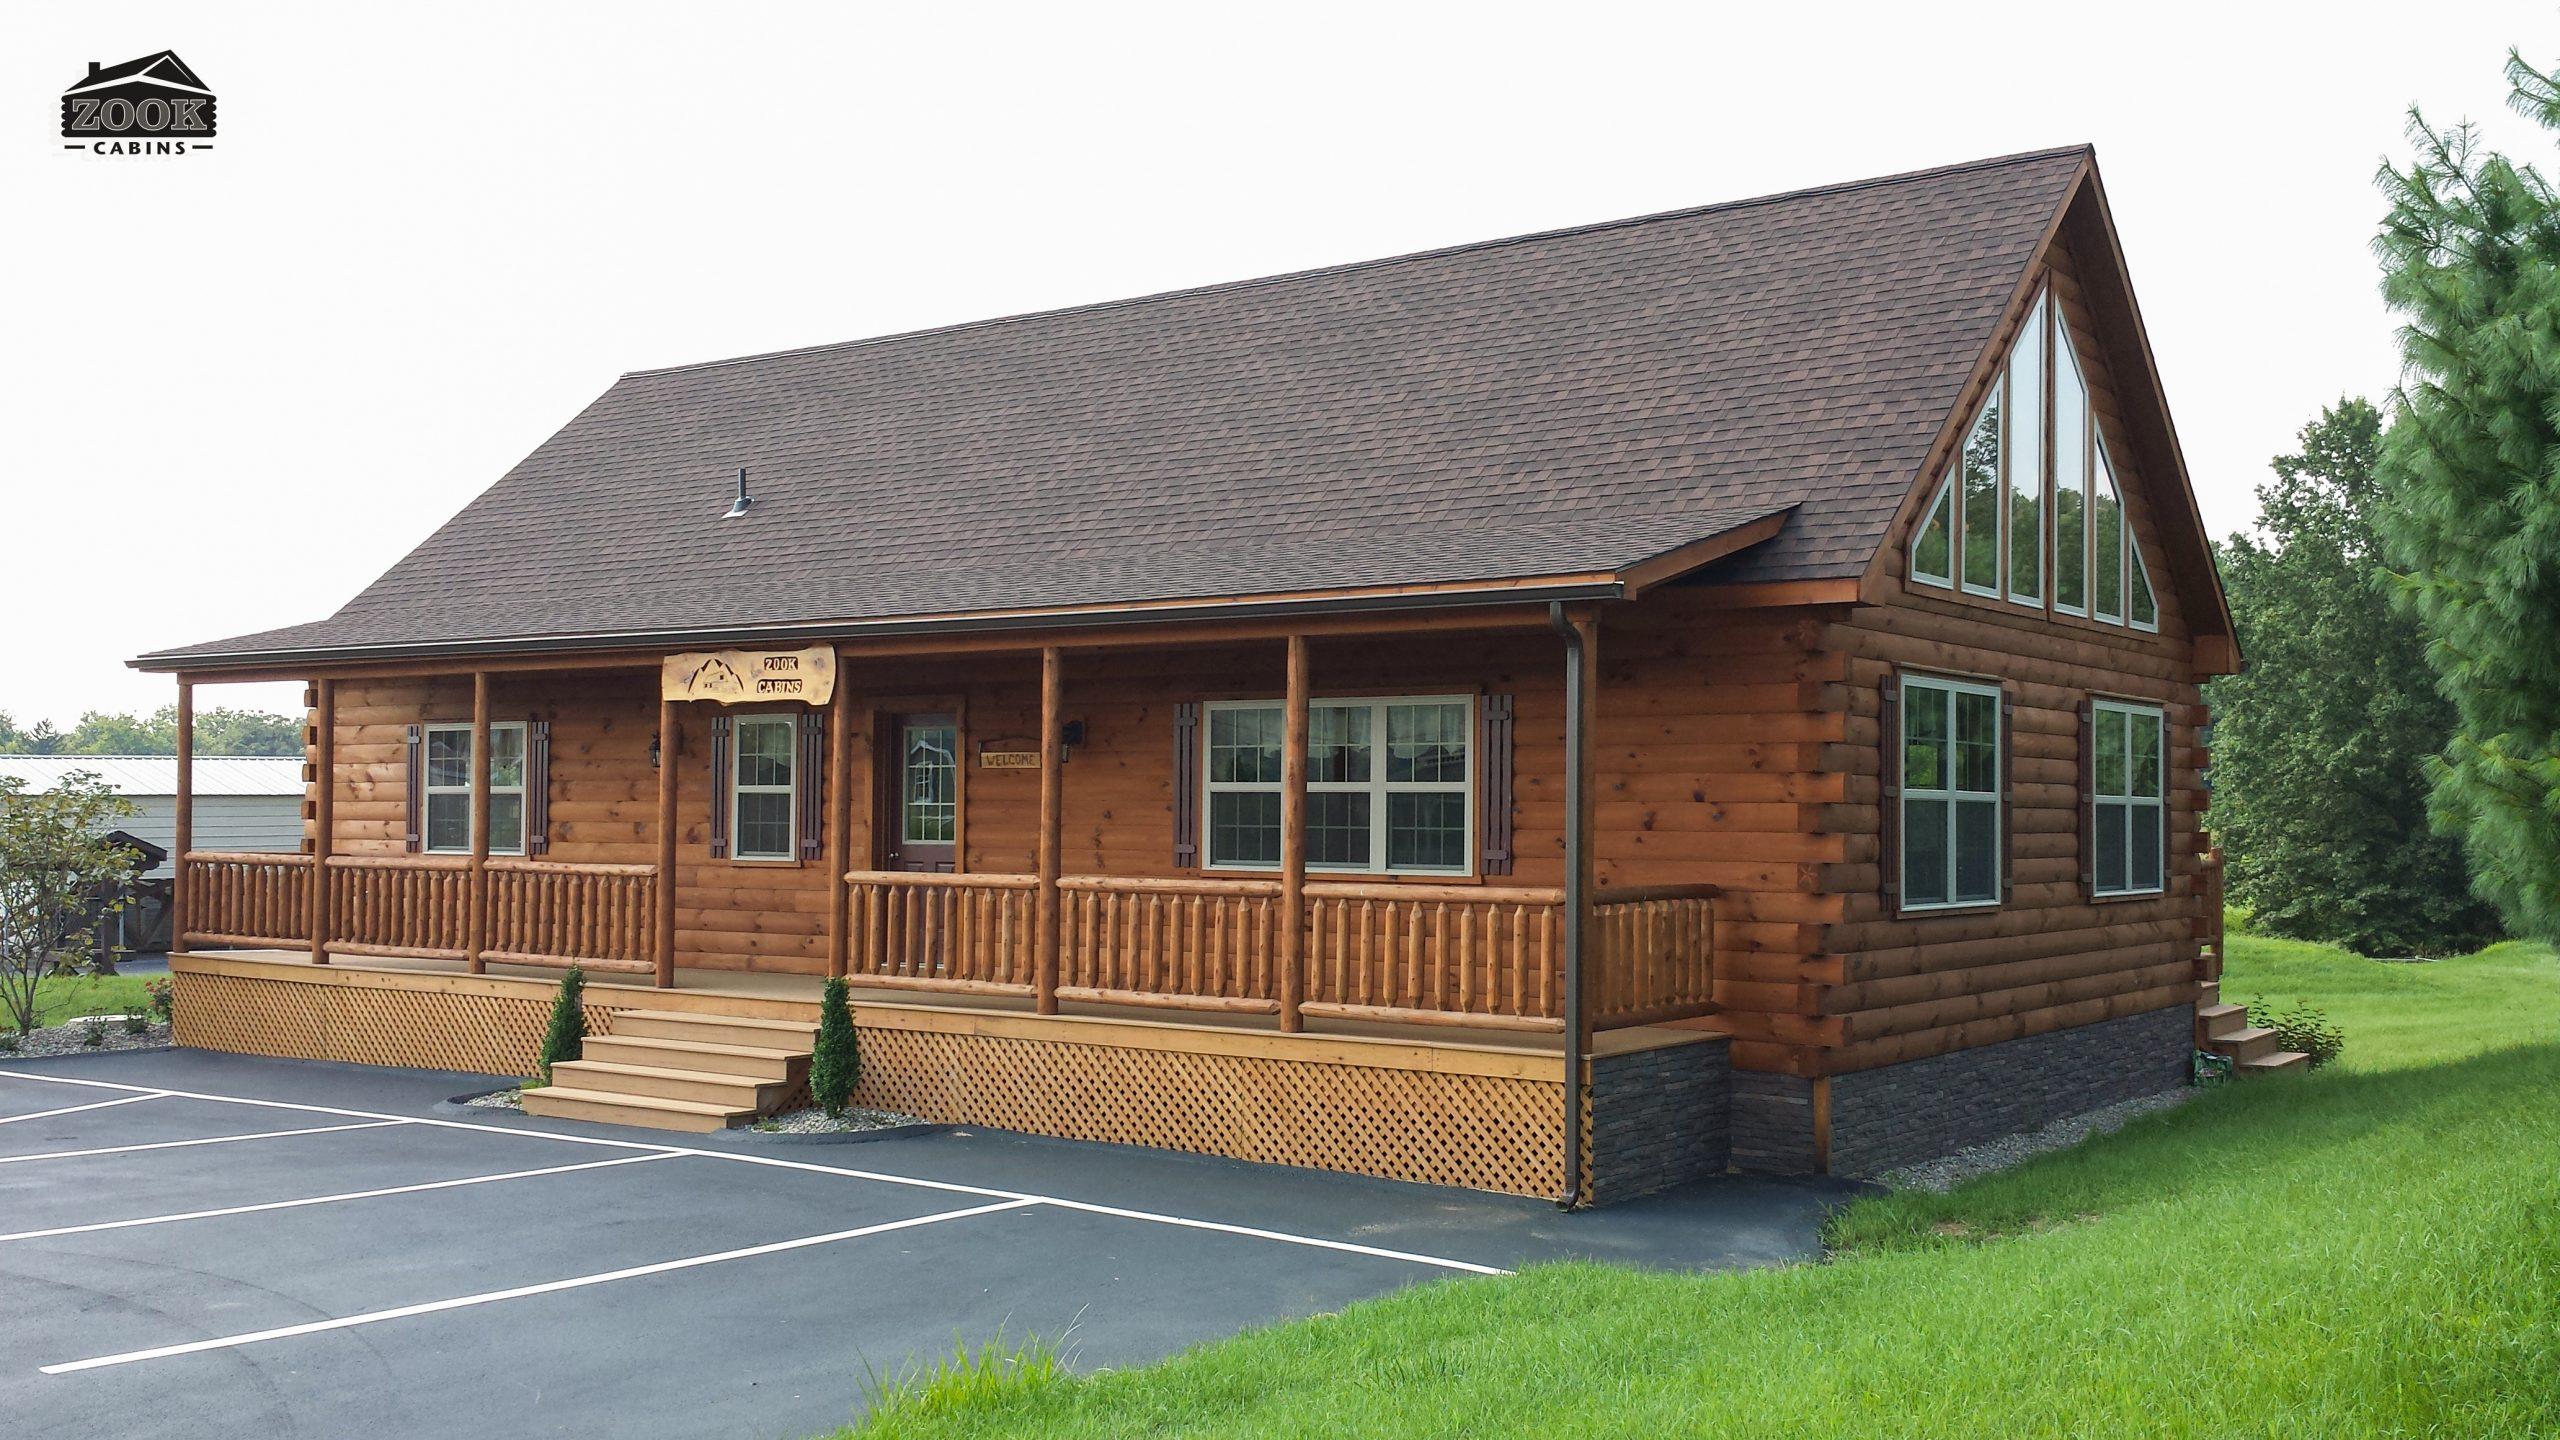 cabin for ideas to build cabin in jefferson new hampshire